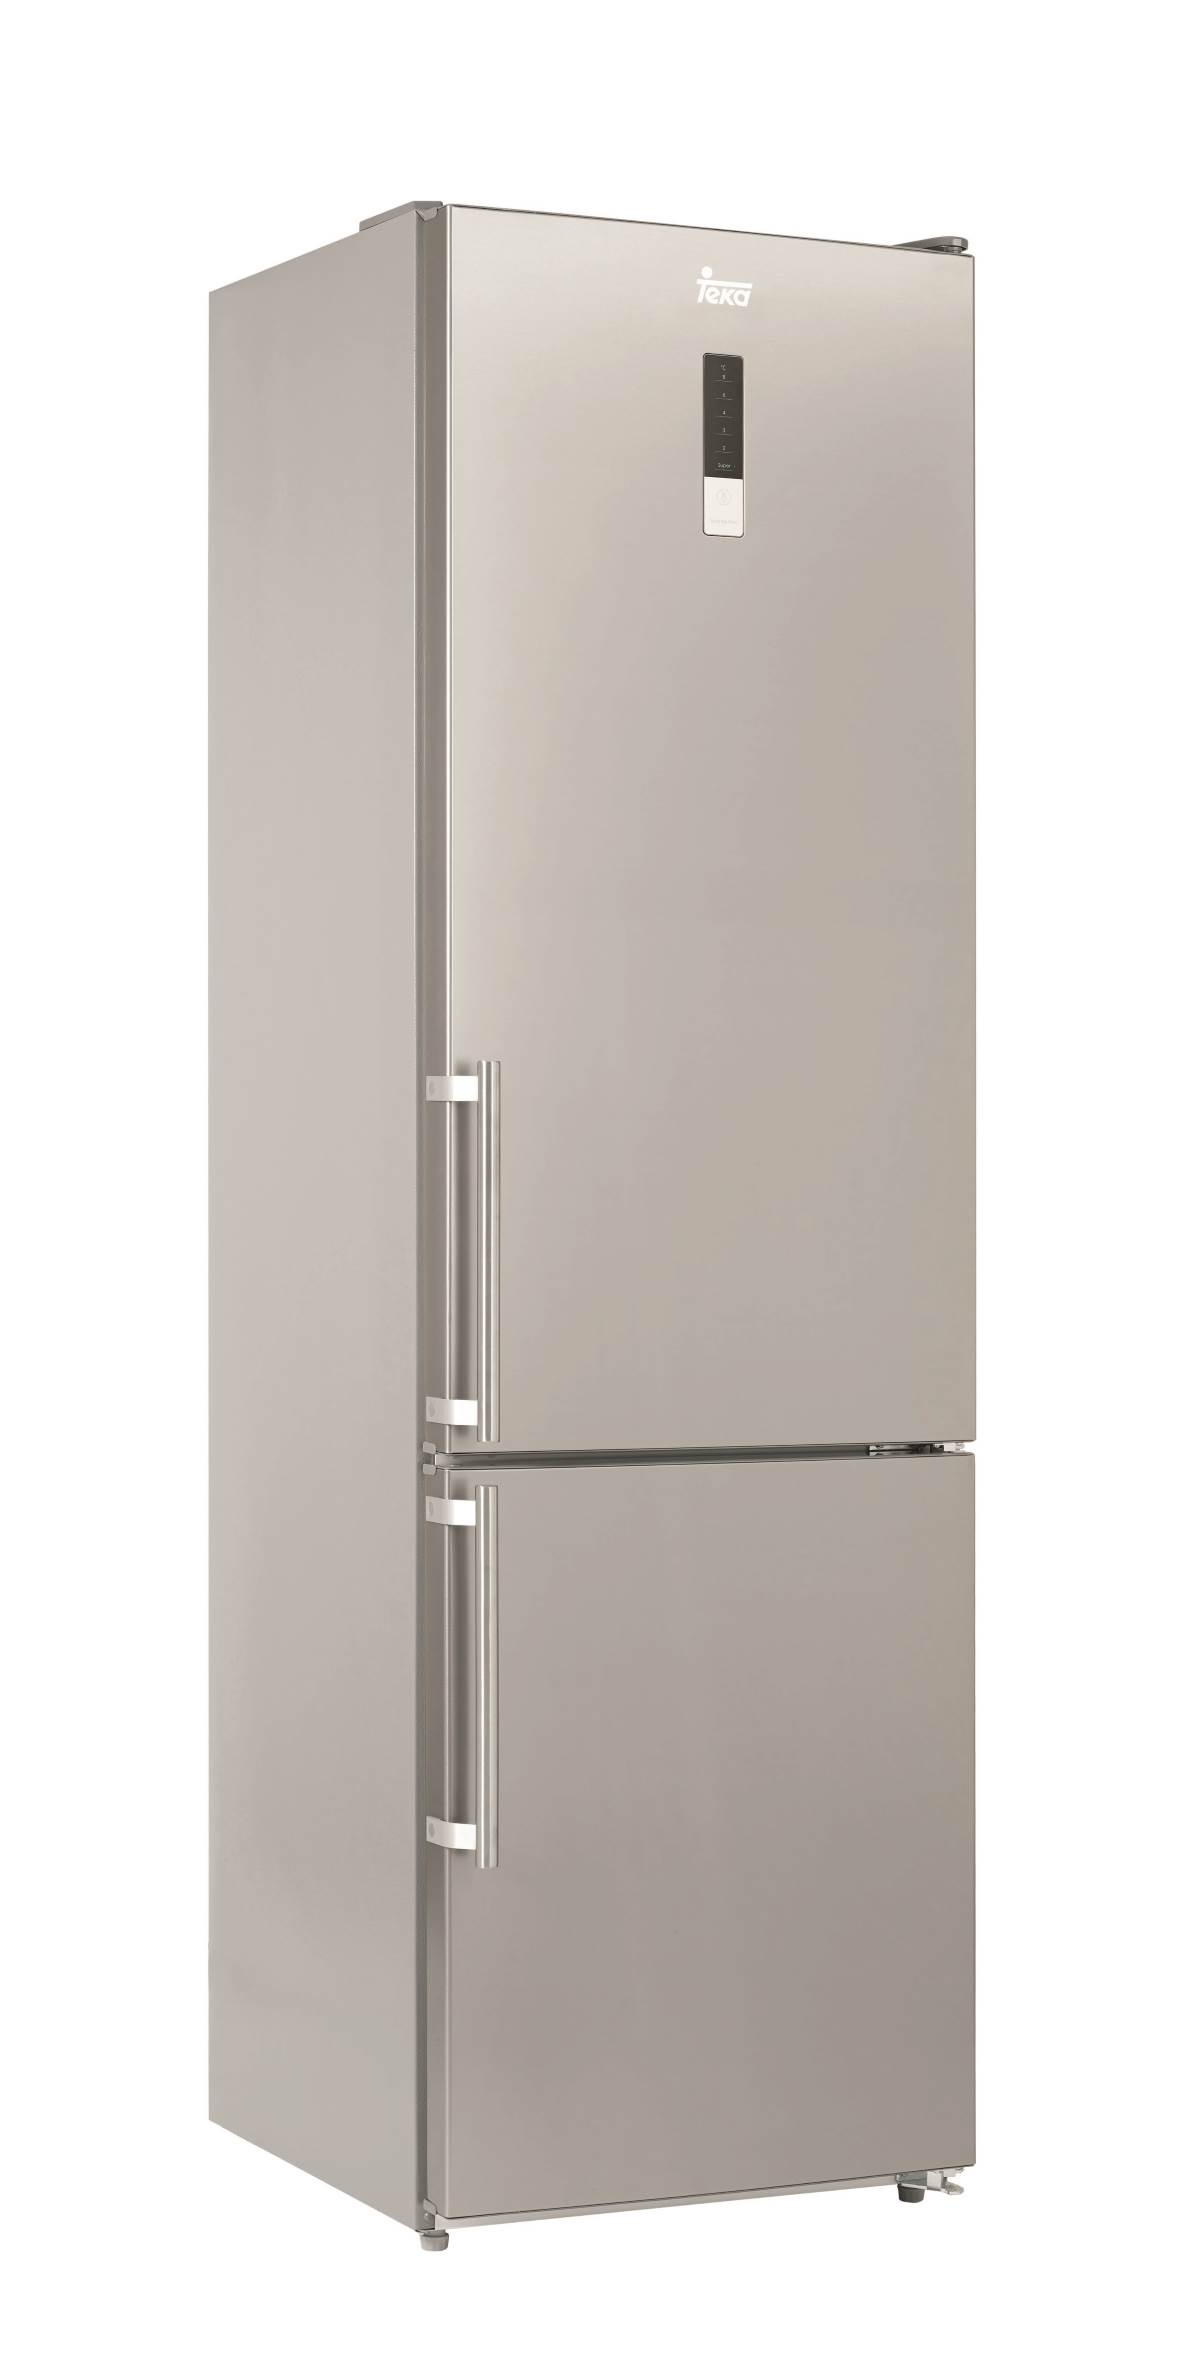 Imagine indisponibila pentru Combina frigorifica Teka NFL 430 E-inox Full No Frost 360 litri clasa A++ inox